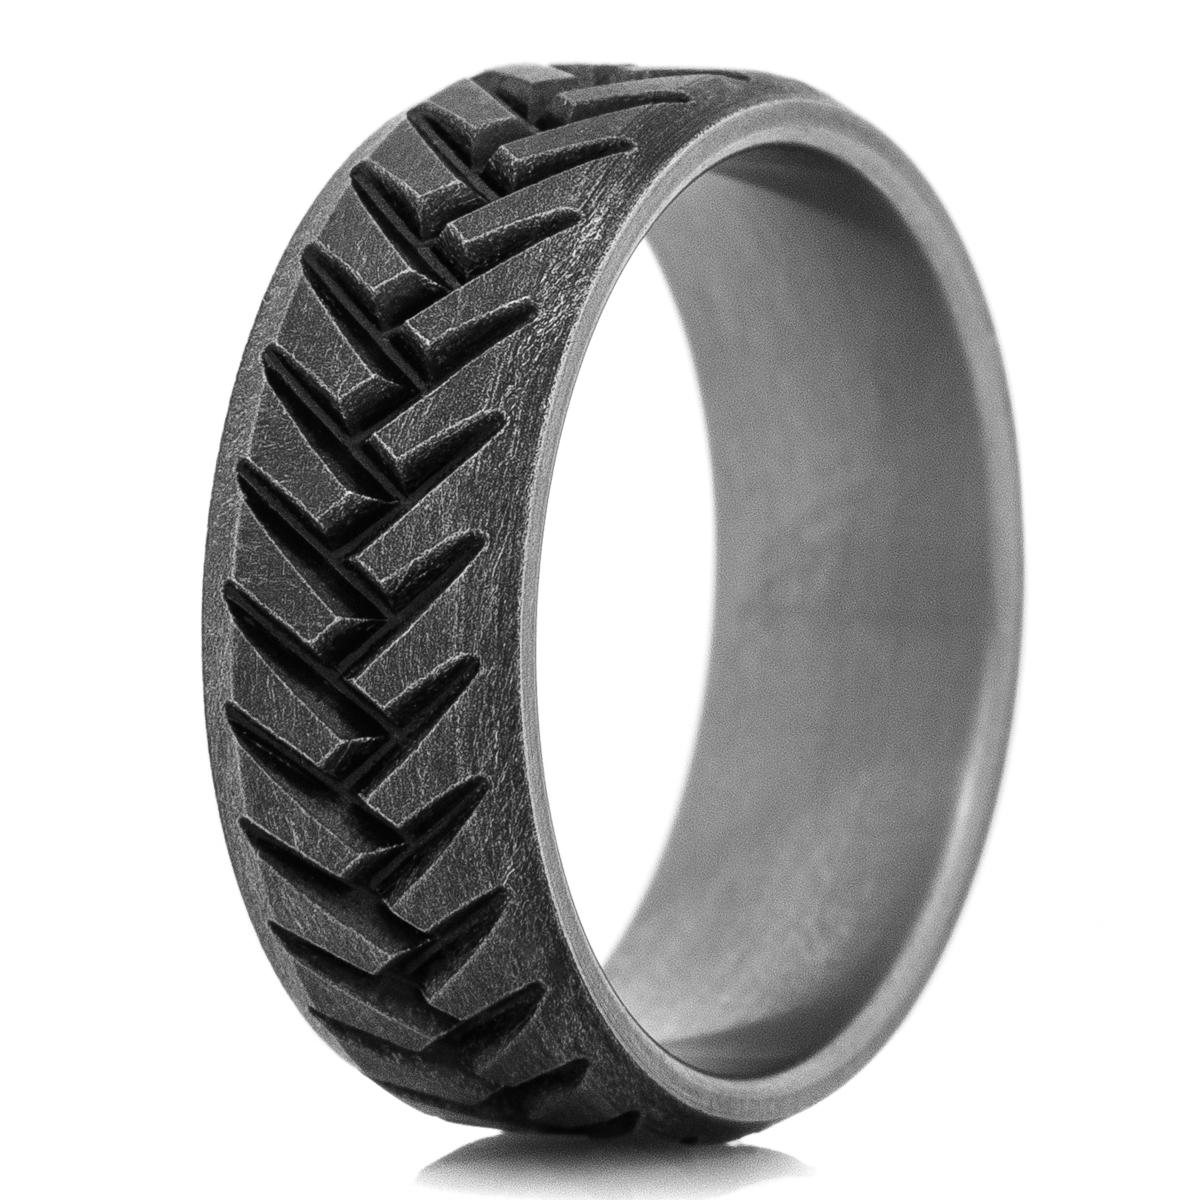 Men's Titanium Battle Worn Laser Carved Tread Ring